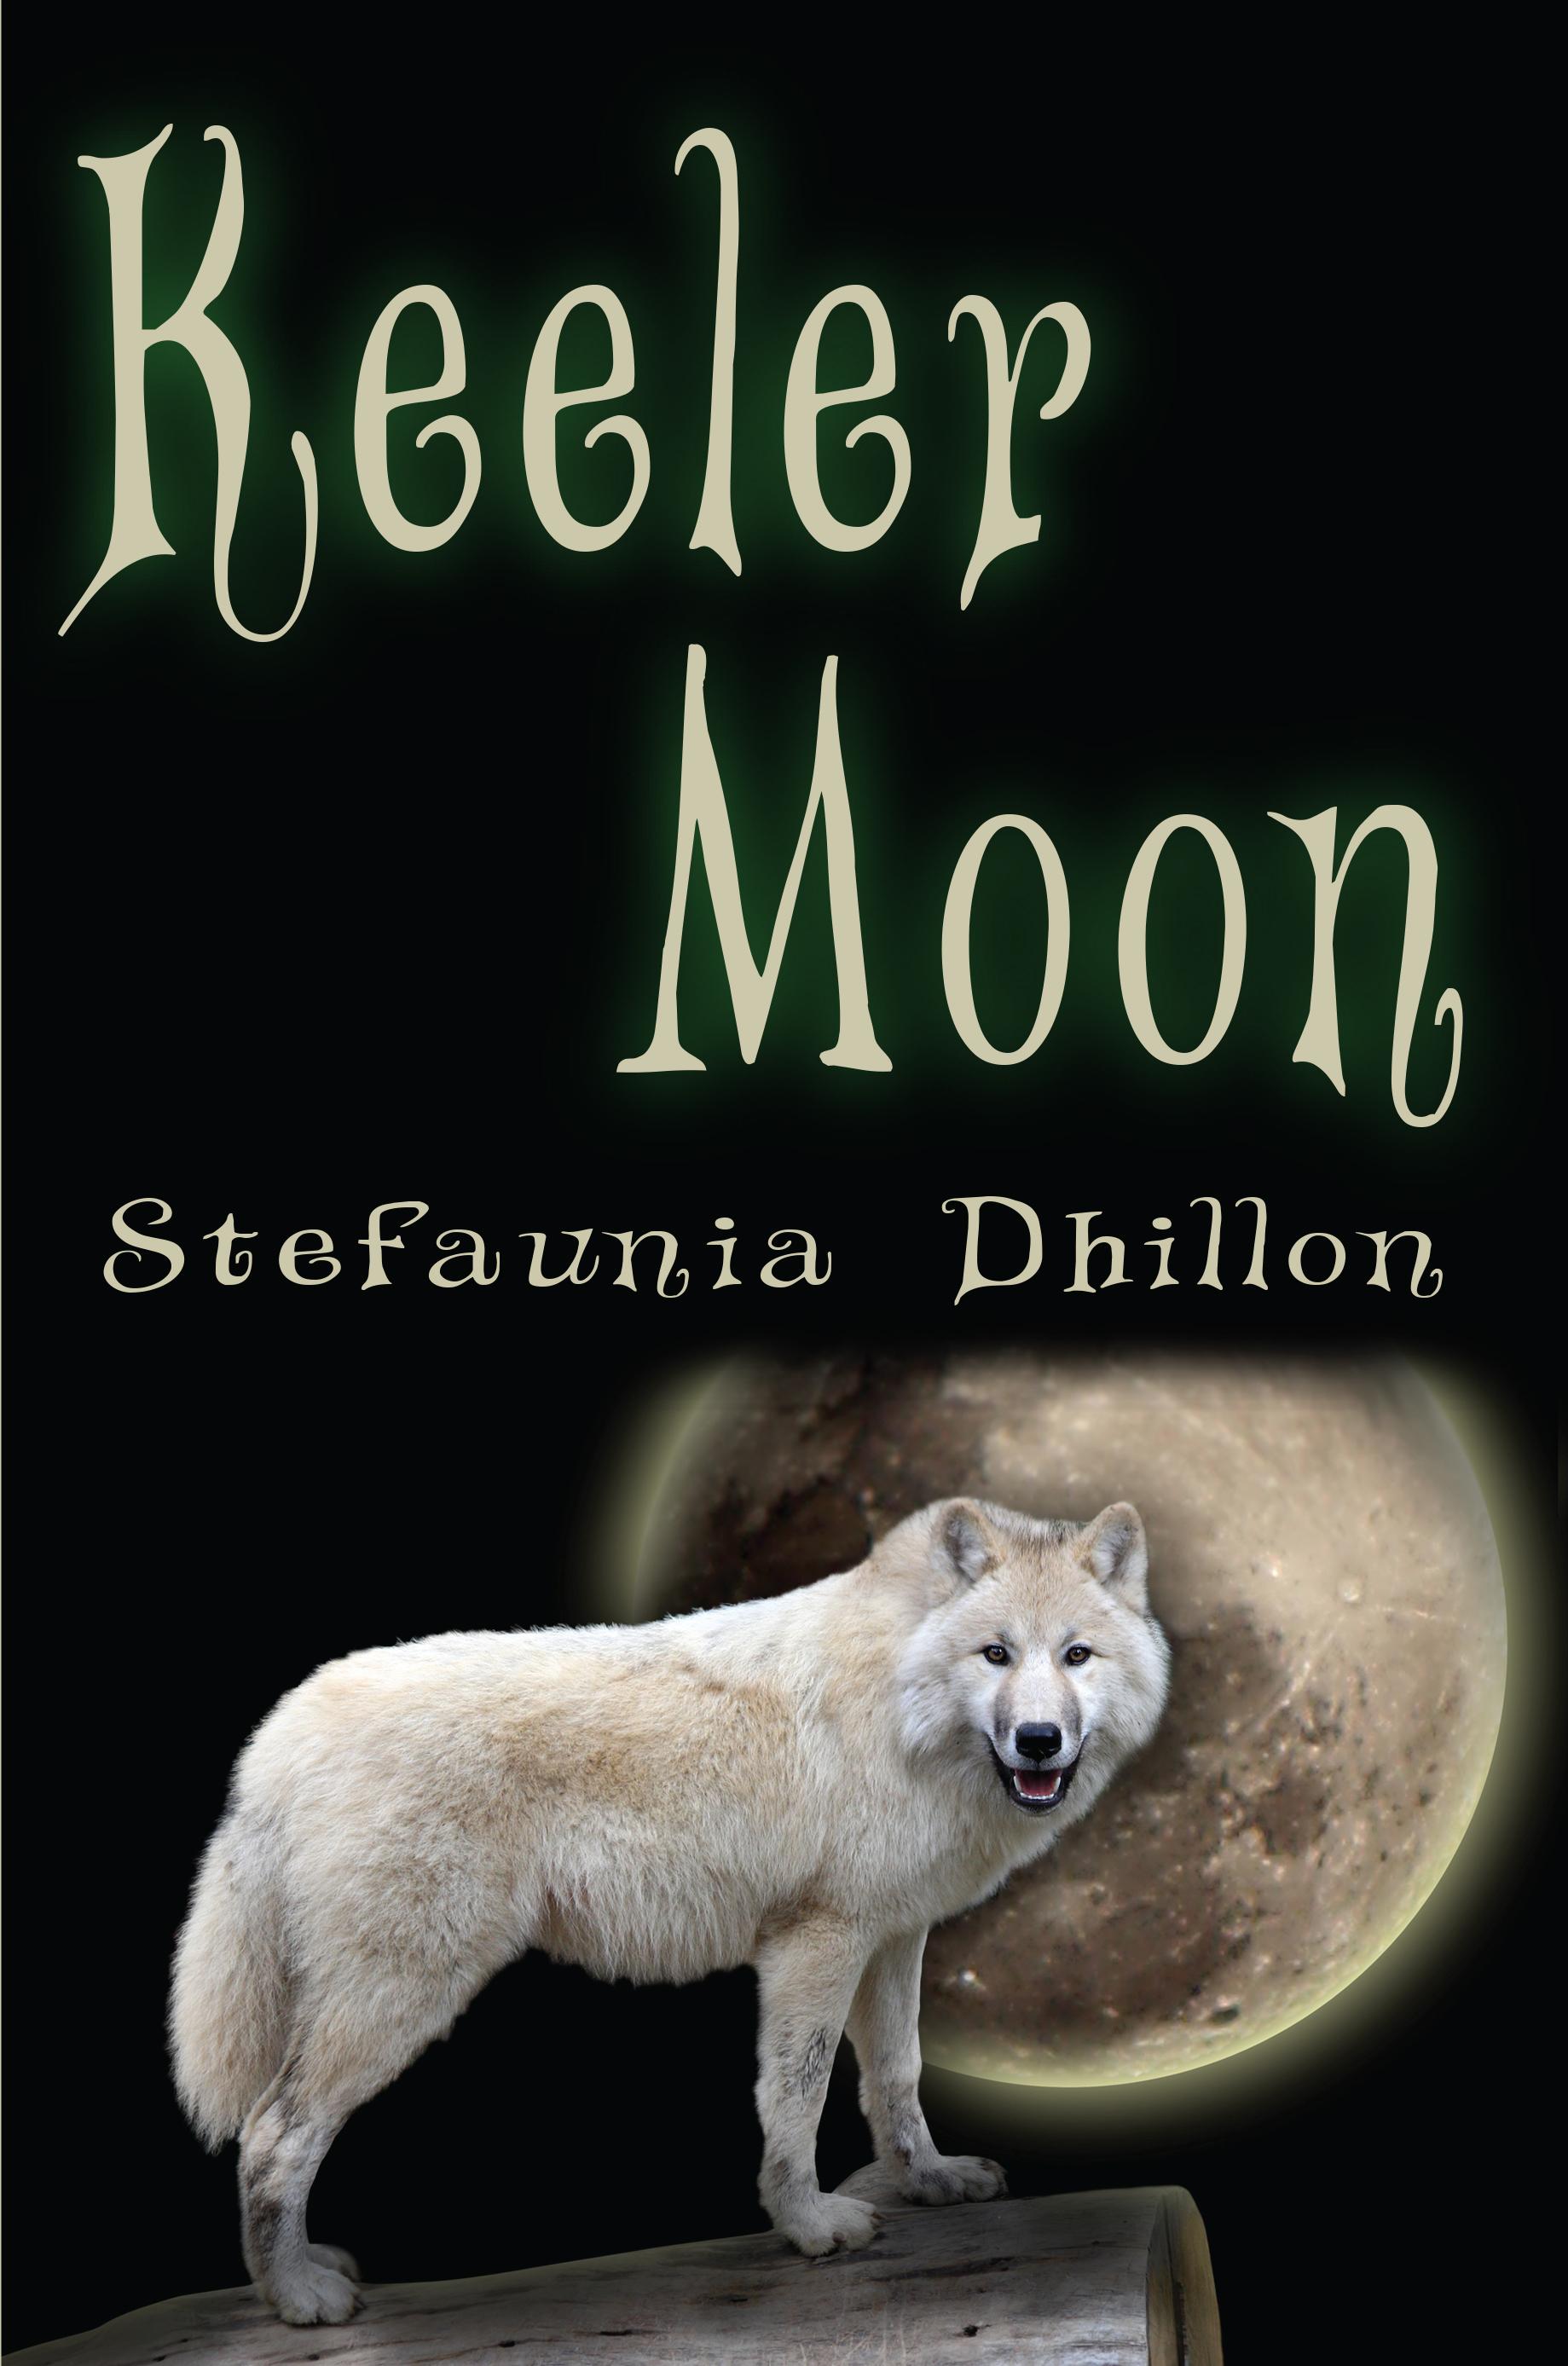 Keeler Moon Stefaunia Dhillon